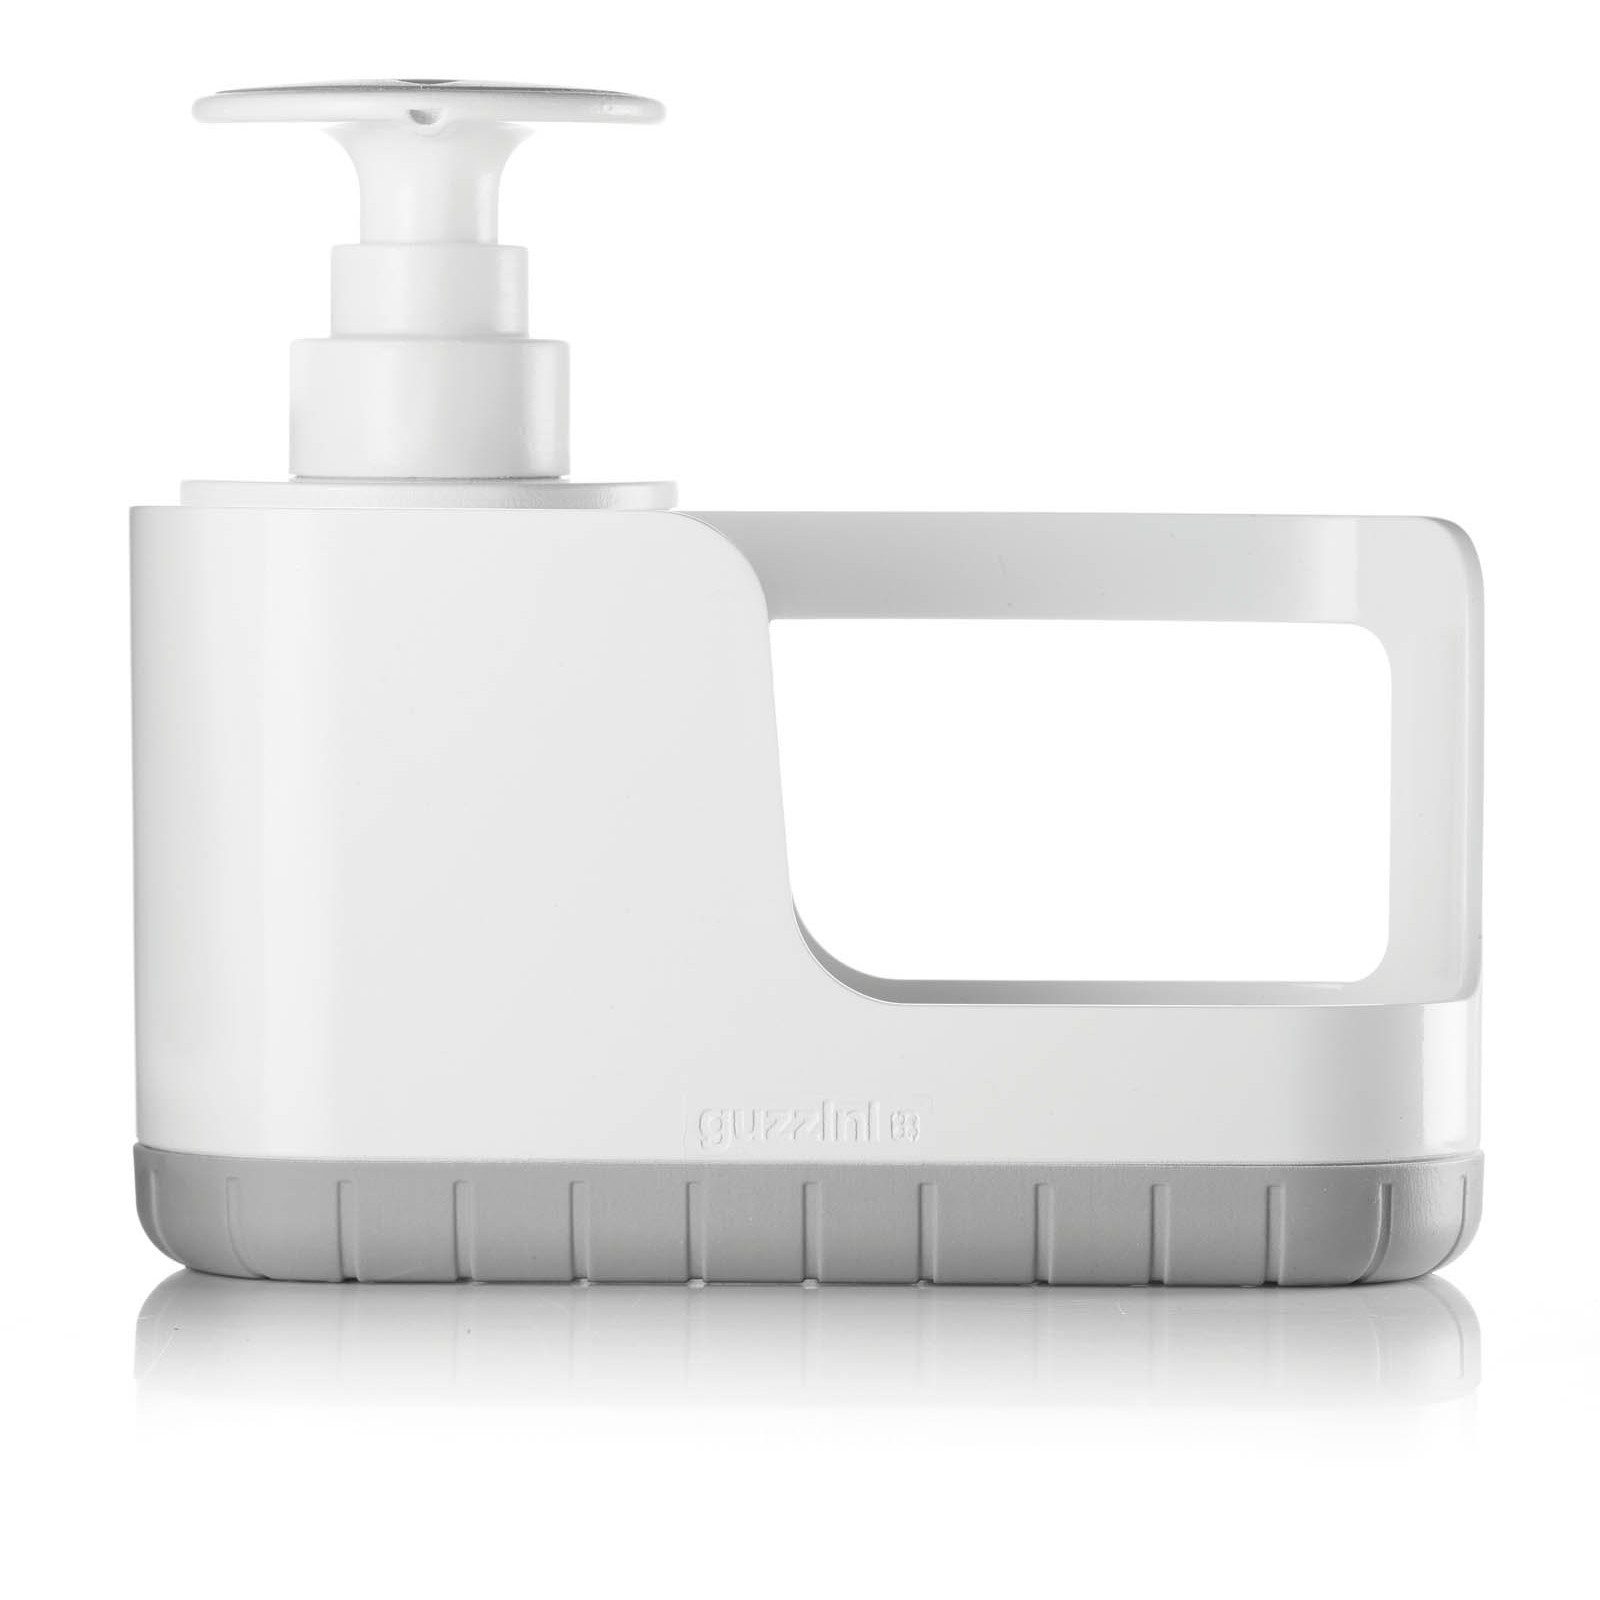 Dispencer Θήκη Για Υγρό Απορυπαντικό Πιάτων Γκρι Guzzini home   αξεσουαρ κουζινας   πιατοθήκες   στεγνωτήρες